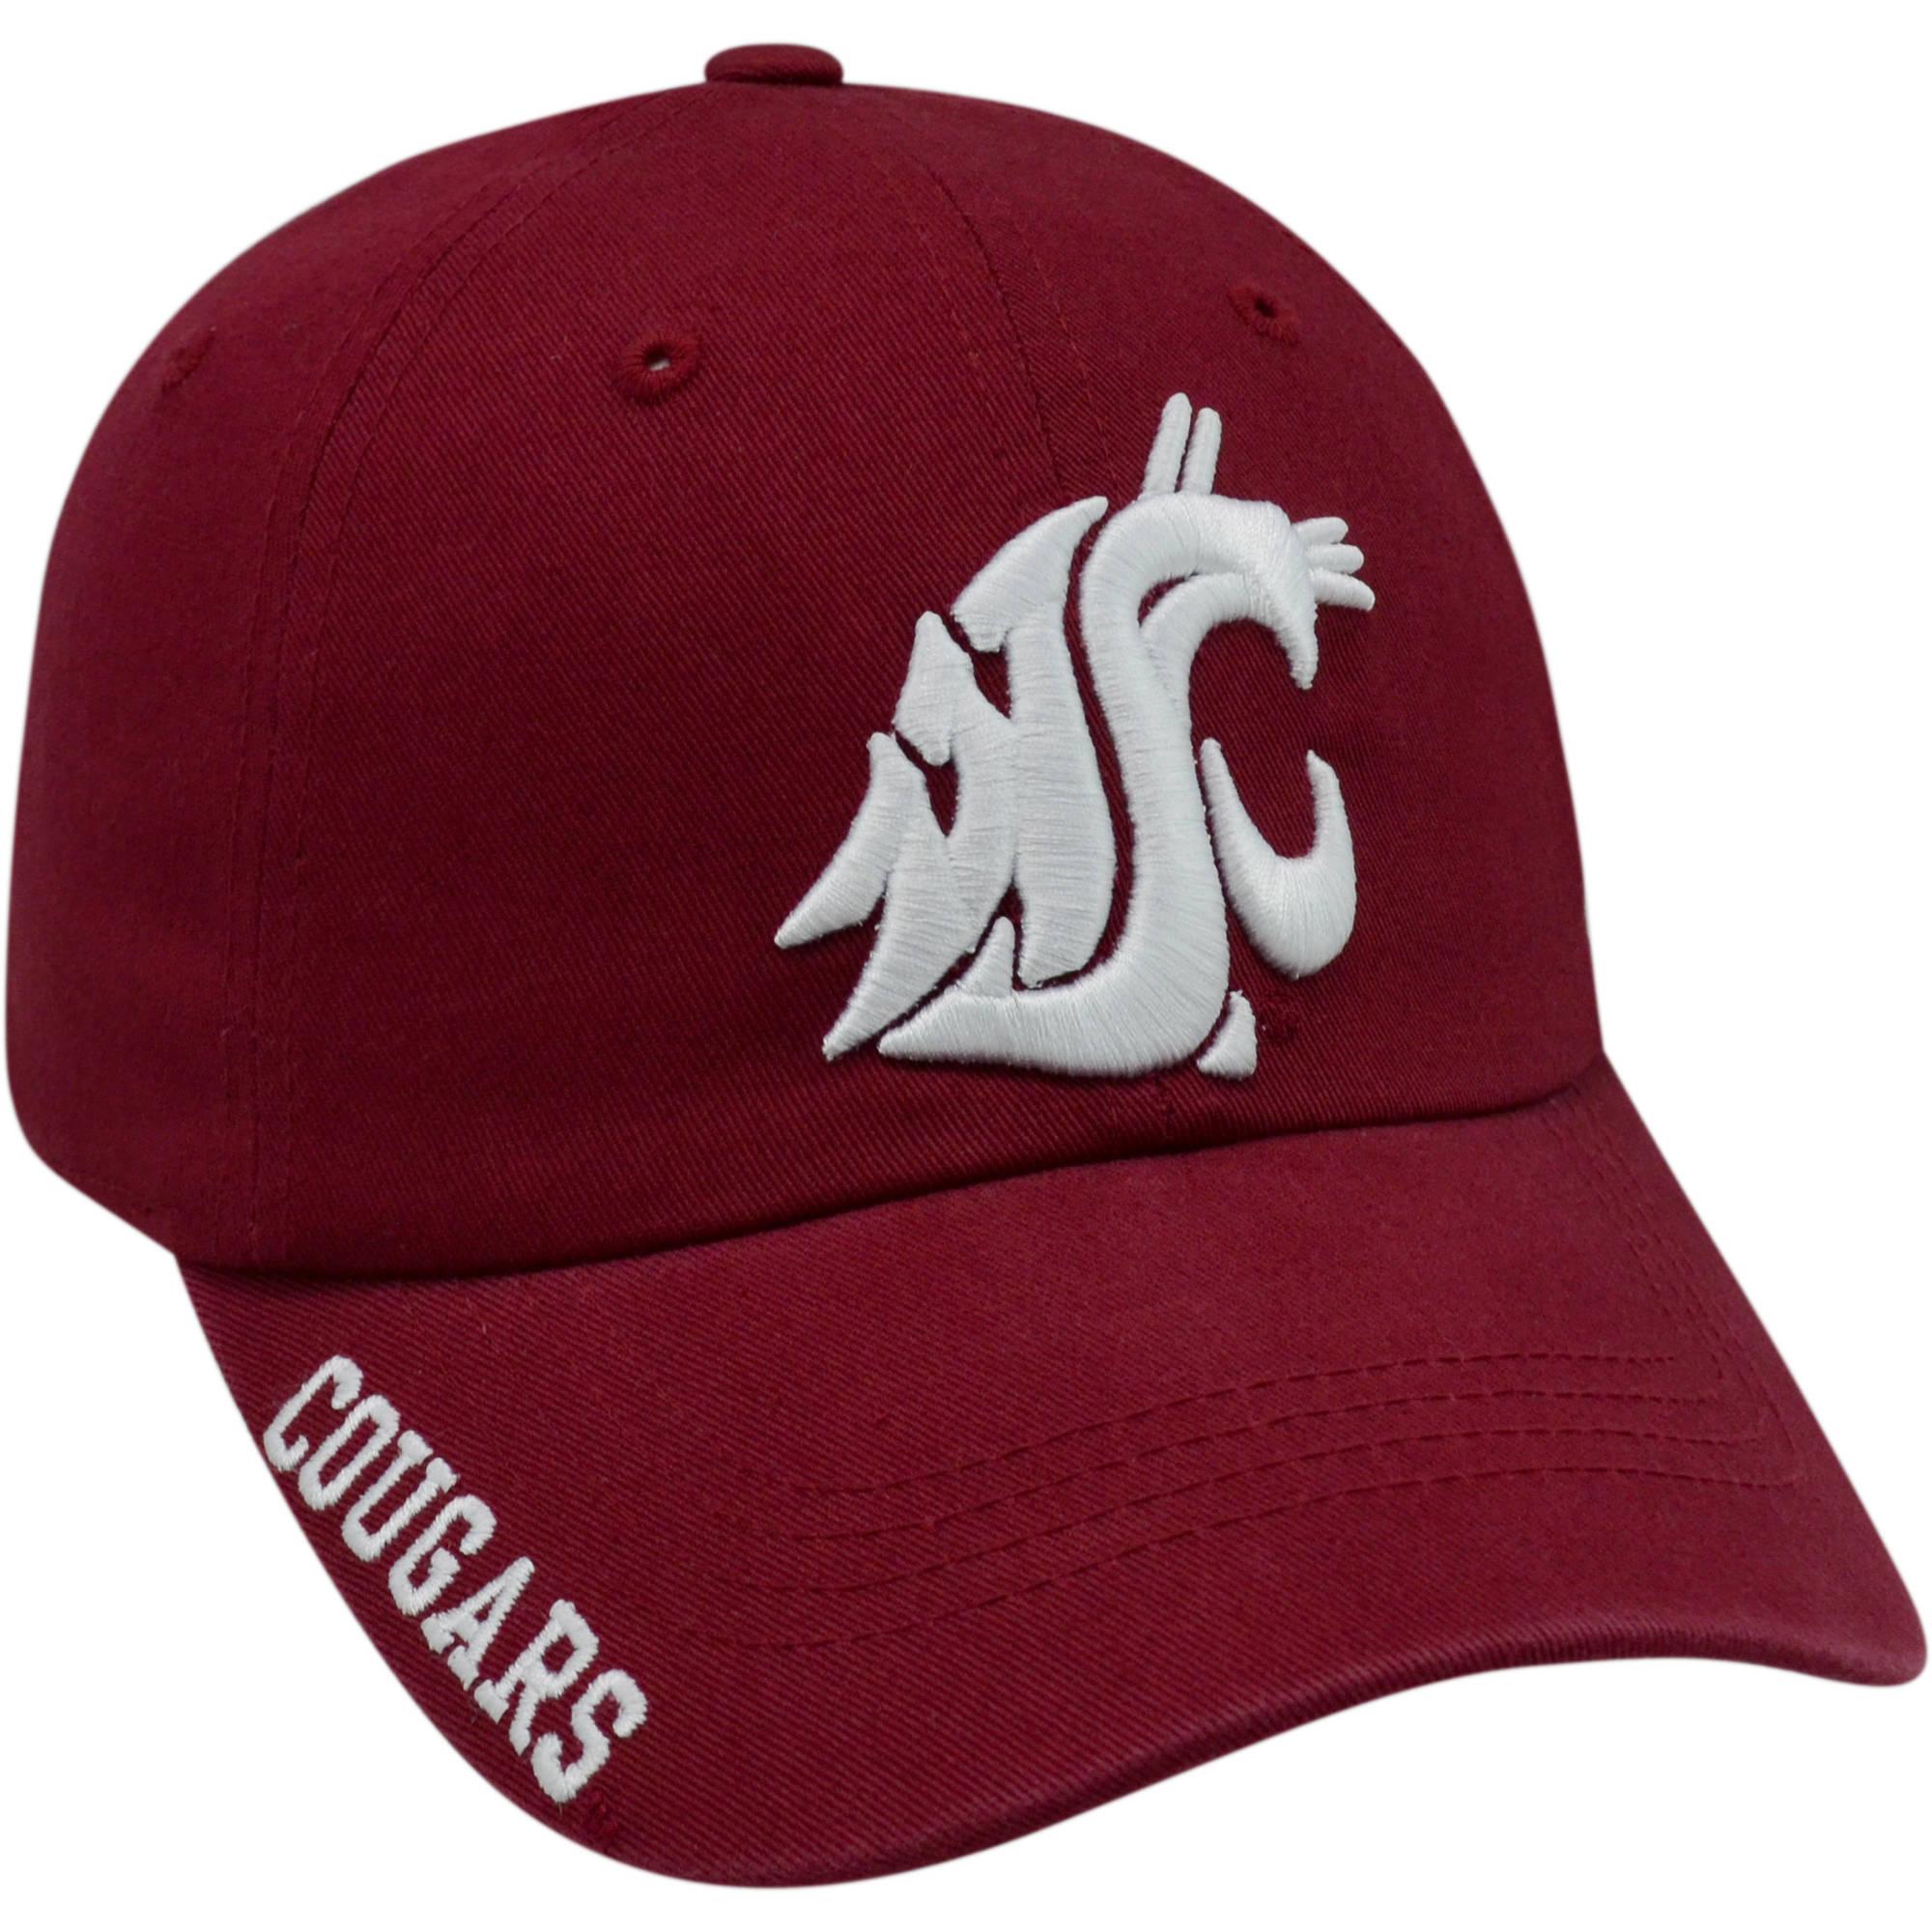 NCAA Men's Washington State Cougars Home Cap